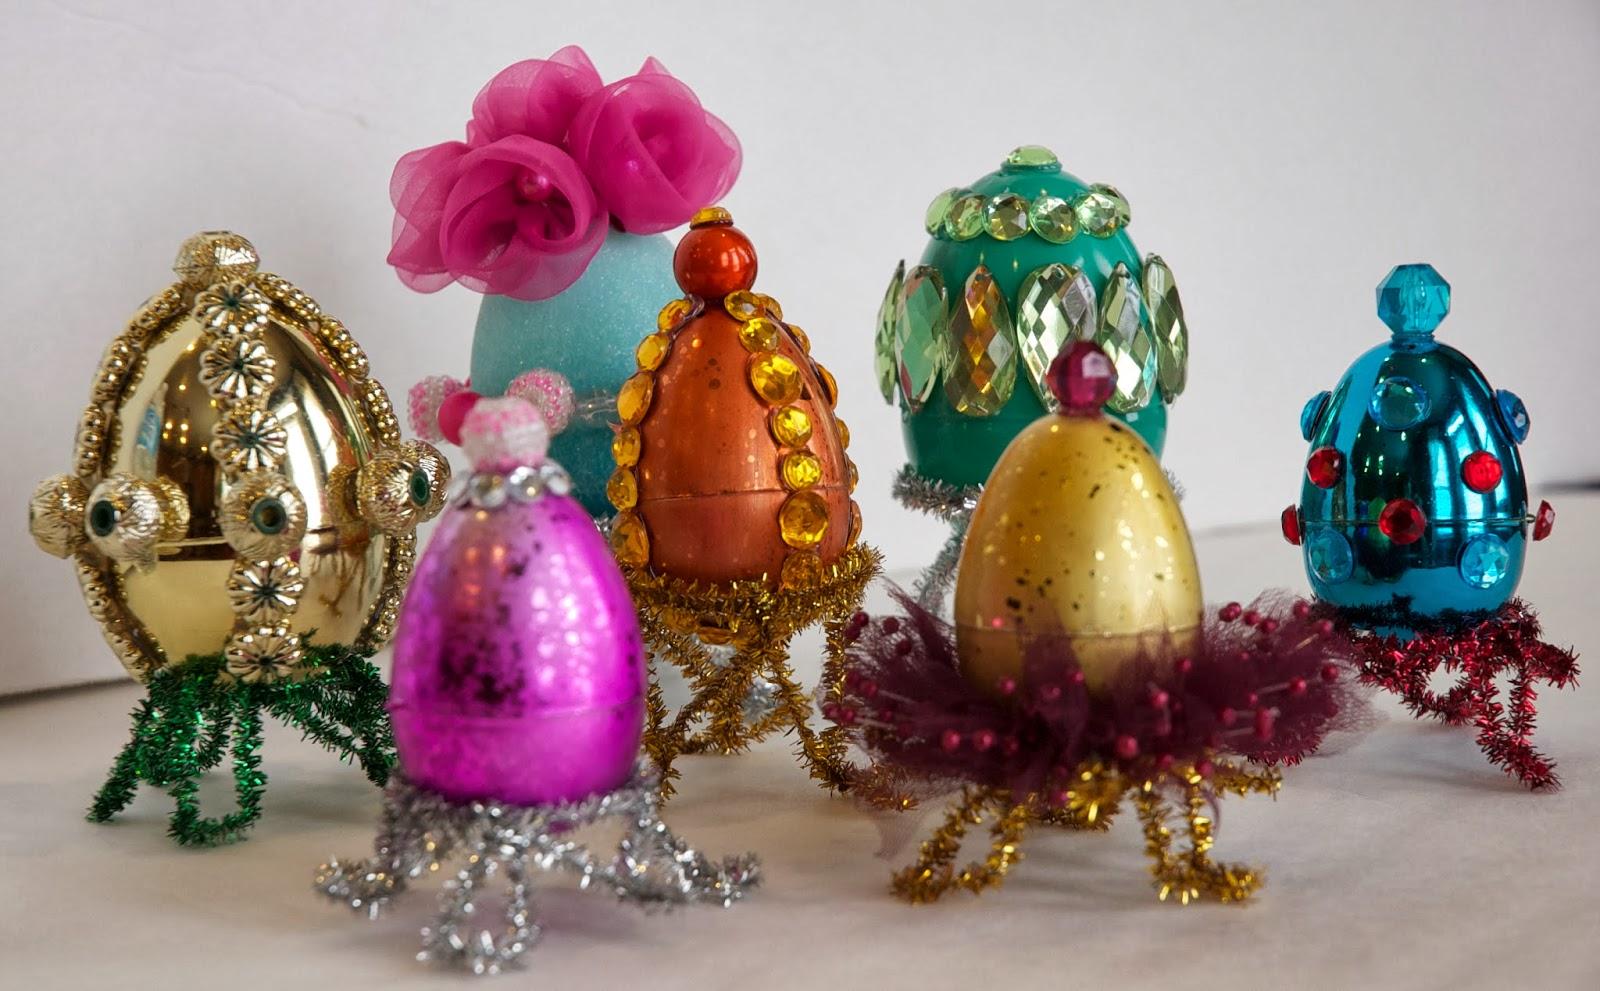 Egg Christmas Ornaments